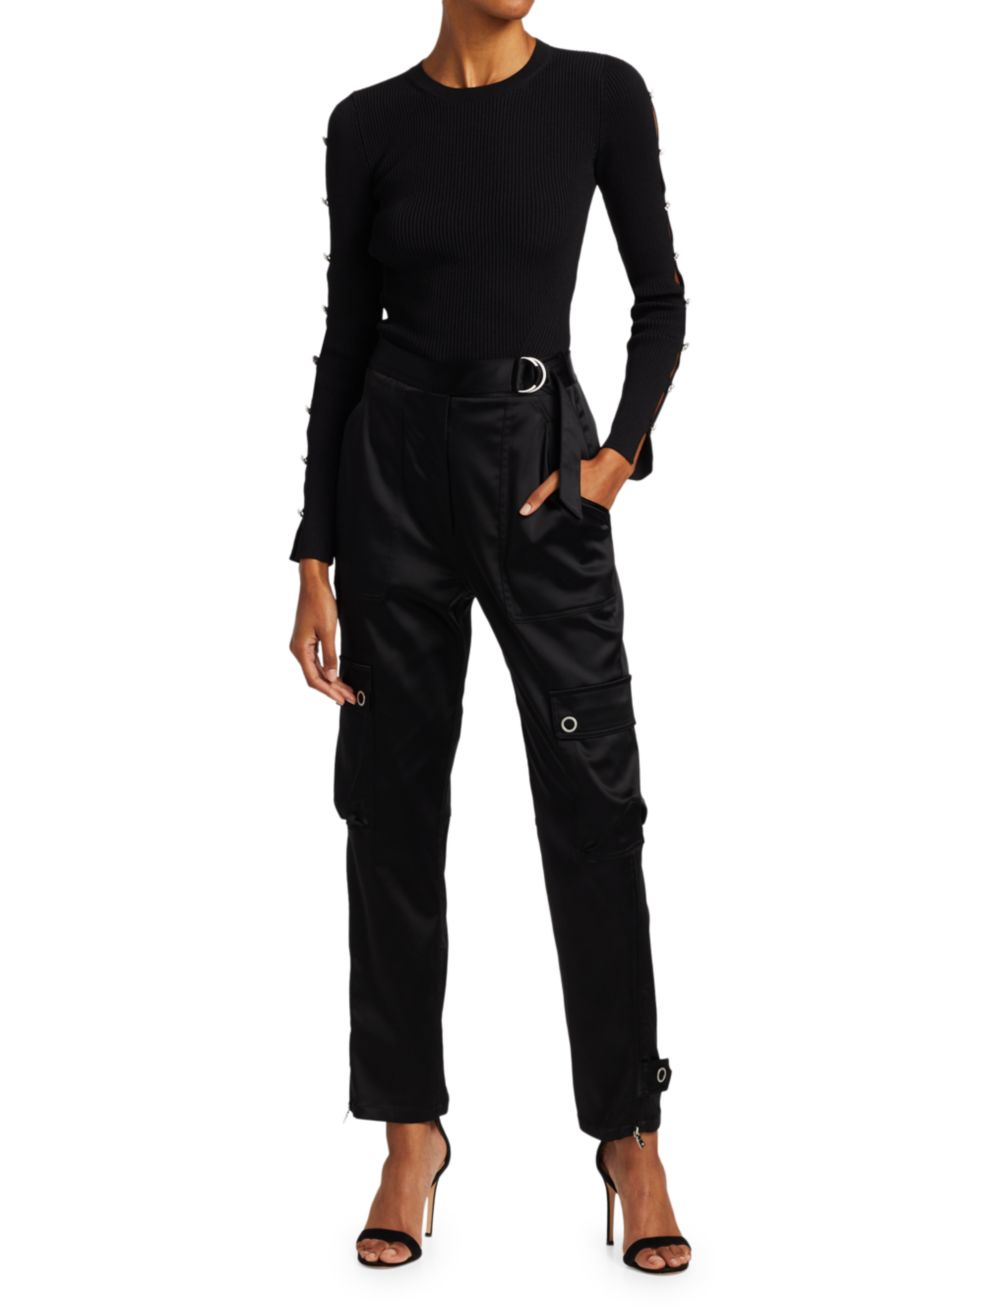 Jonathan Simkhai Giulianna Compact Rib Diamonte Cutout Sleeve Top   SaksFifthAvenue